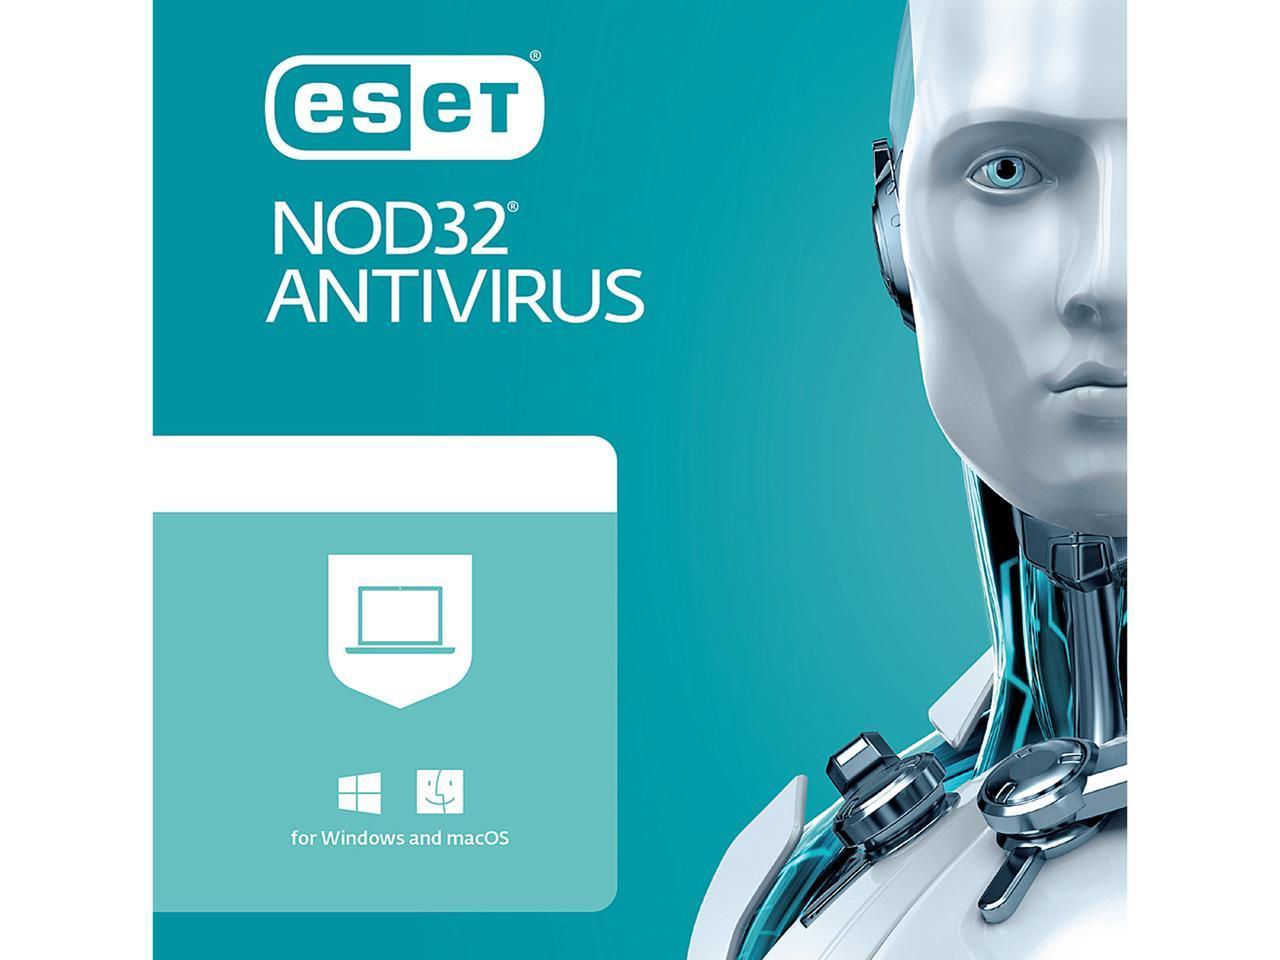 ESET NOD32 Antivirus 2021 1 Year / 2 PCs - Download $19.99